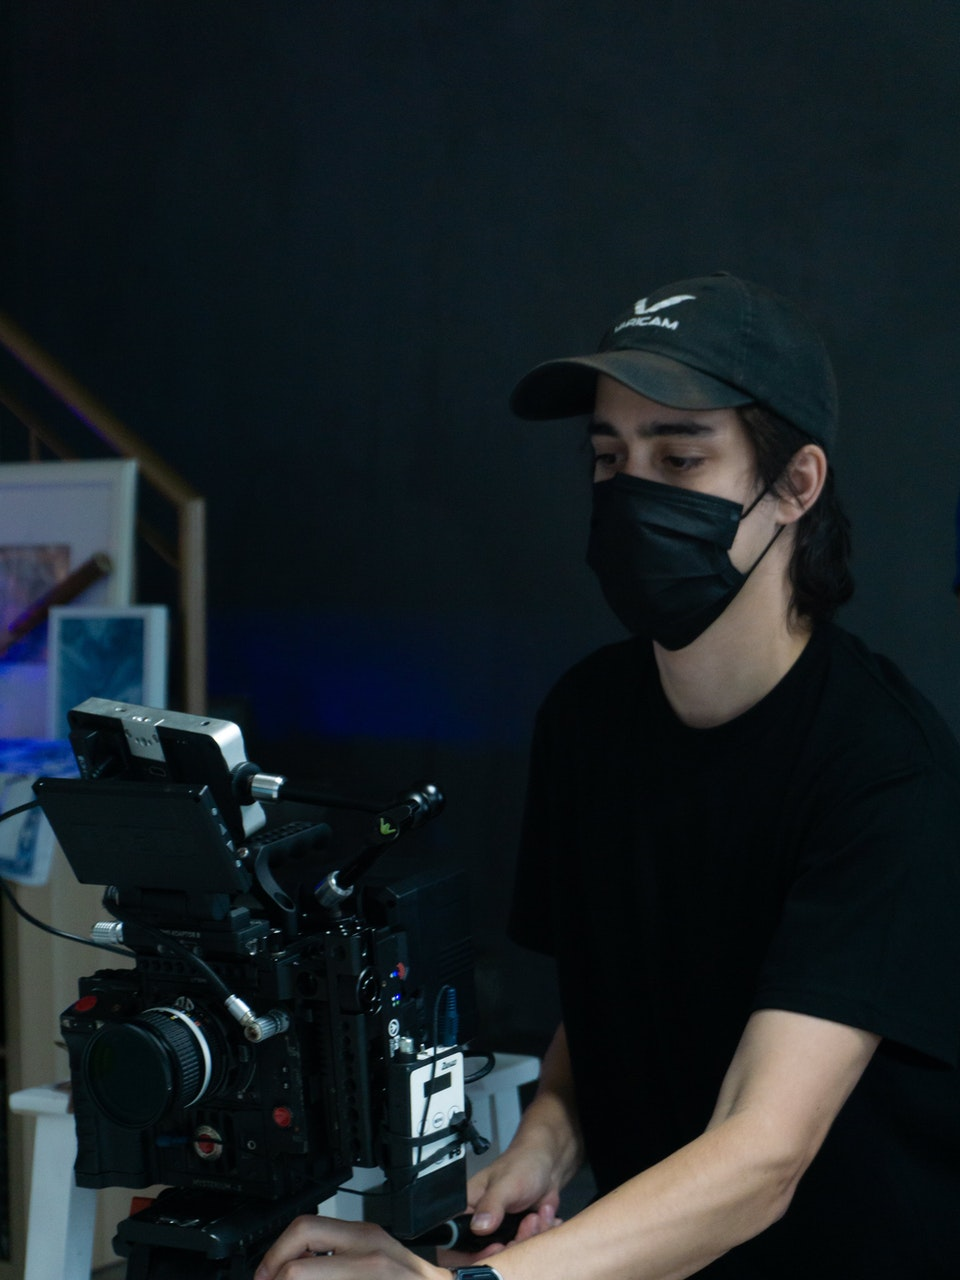 electriclimefilms - SkillsFuture 'When I Grow Up'